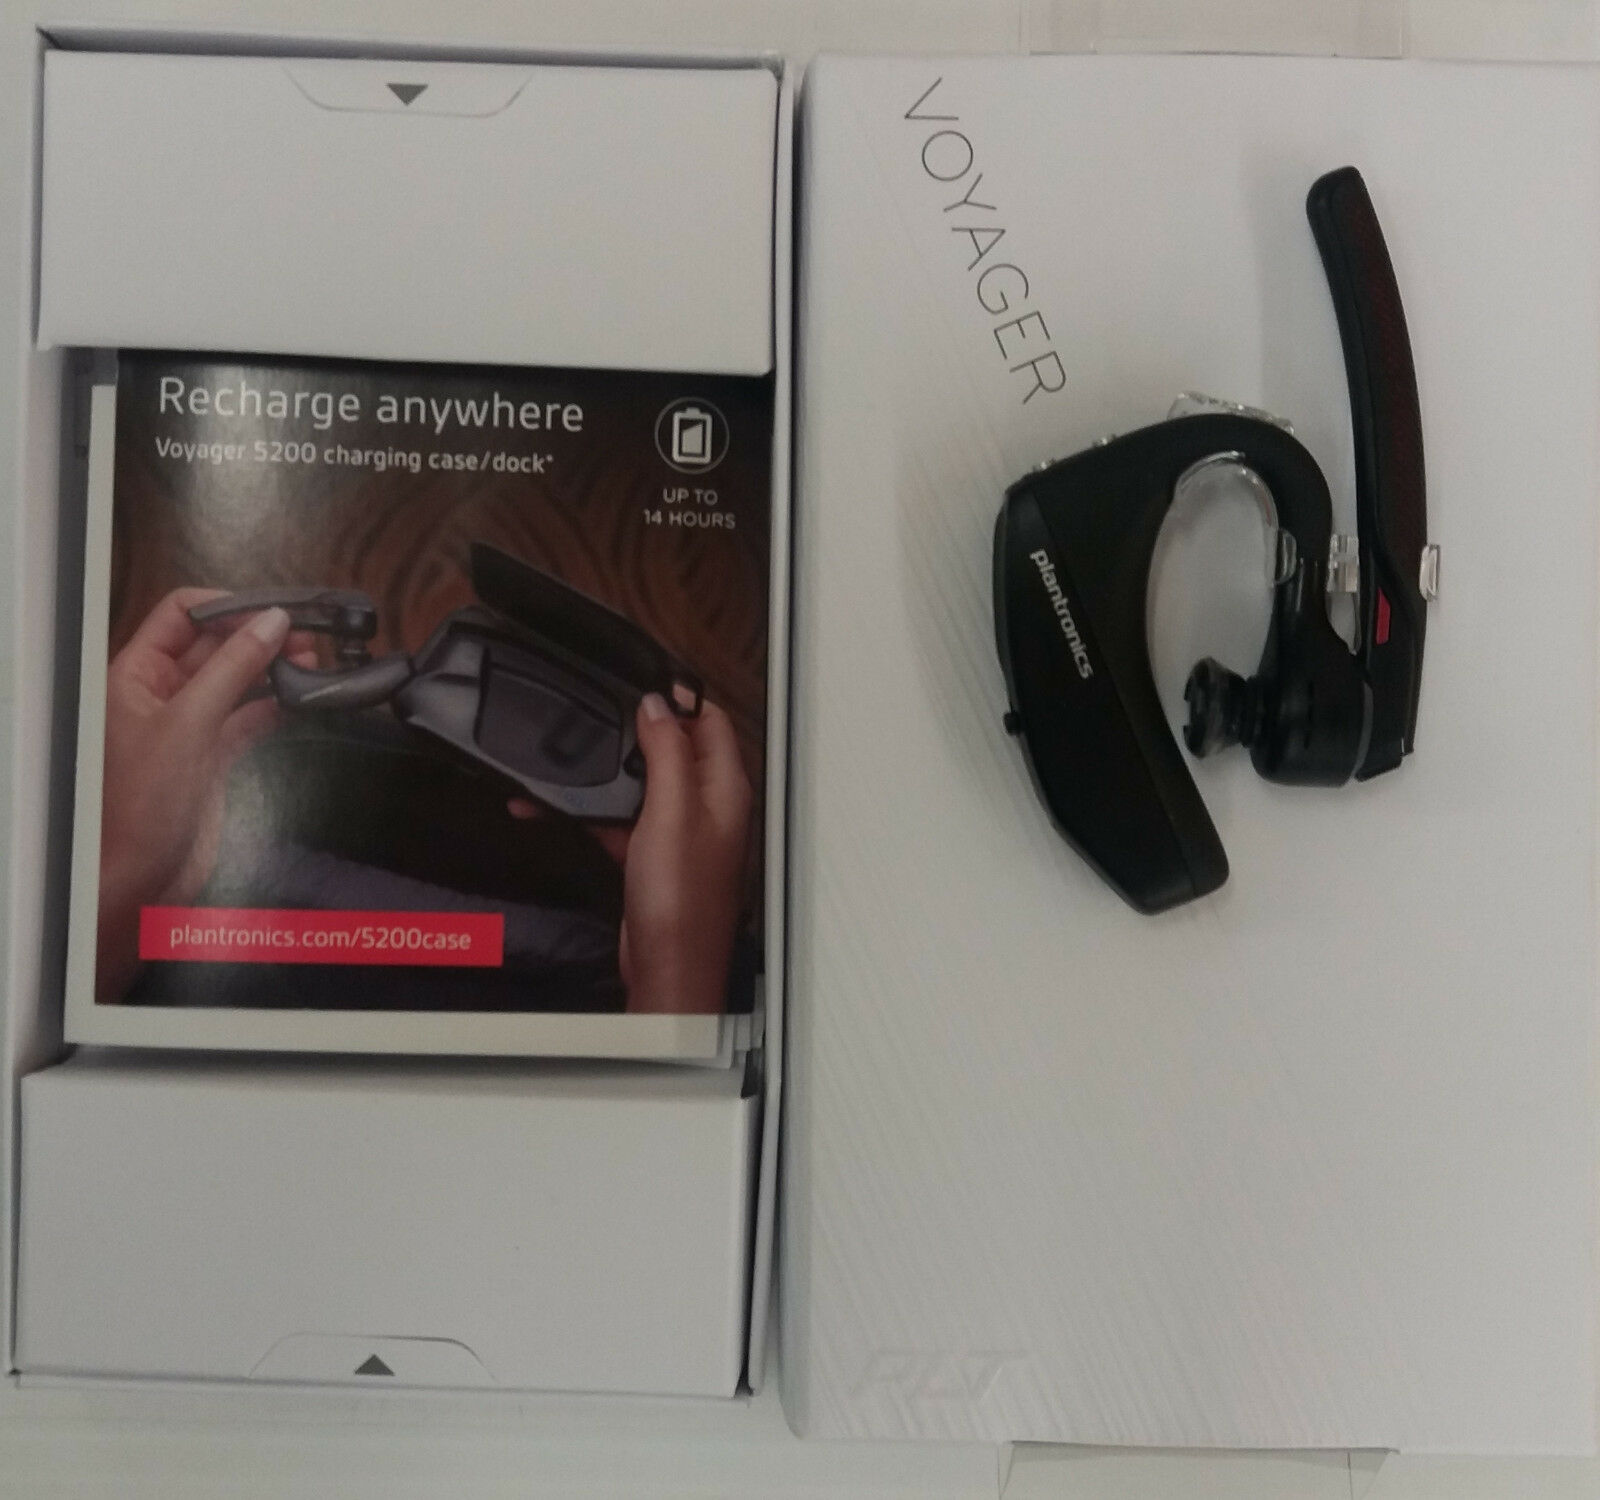 Details about *OEM Plantronics Voyager 5200 Bluetooth Headset Earpiece  WindSmart 203500-01